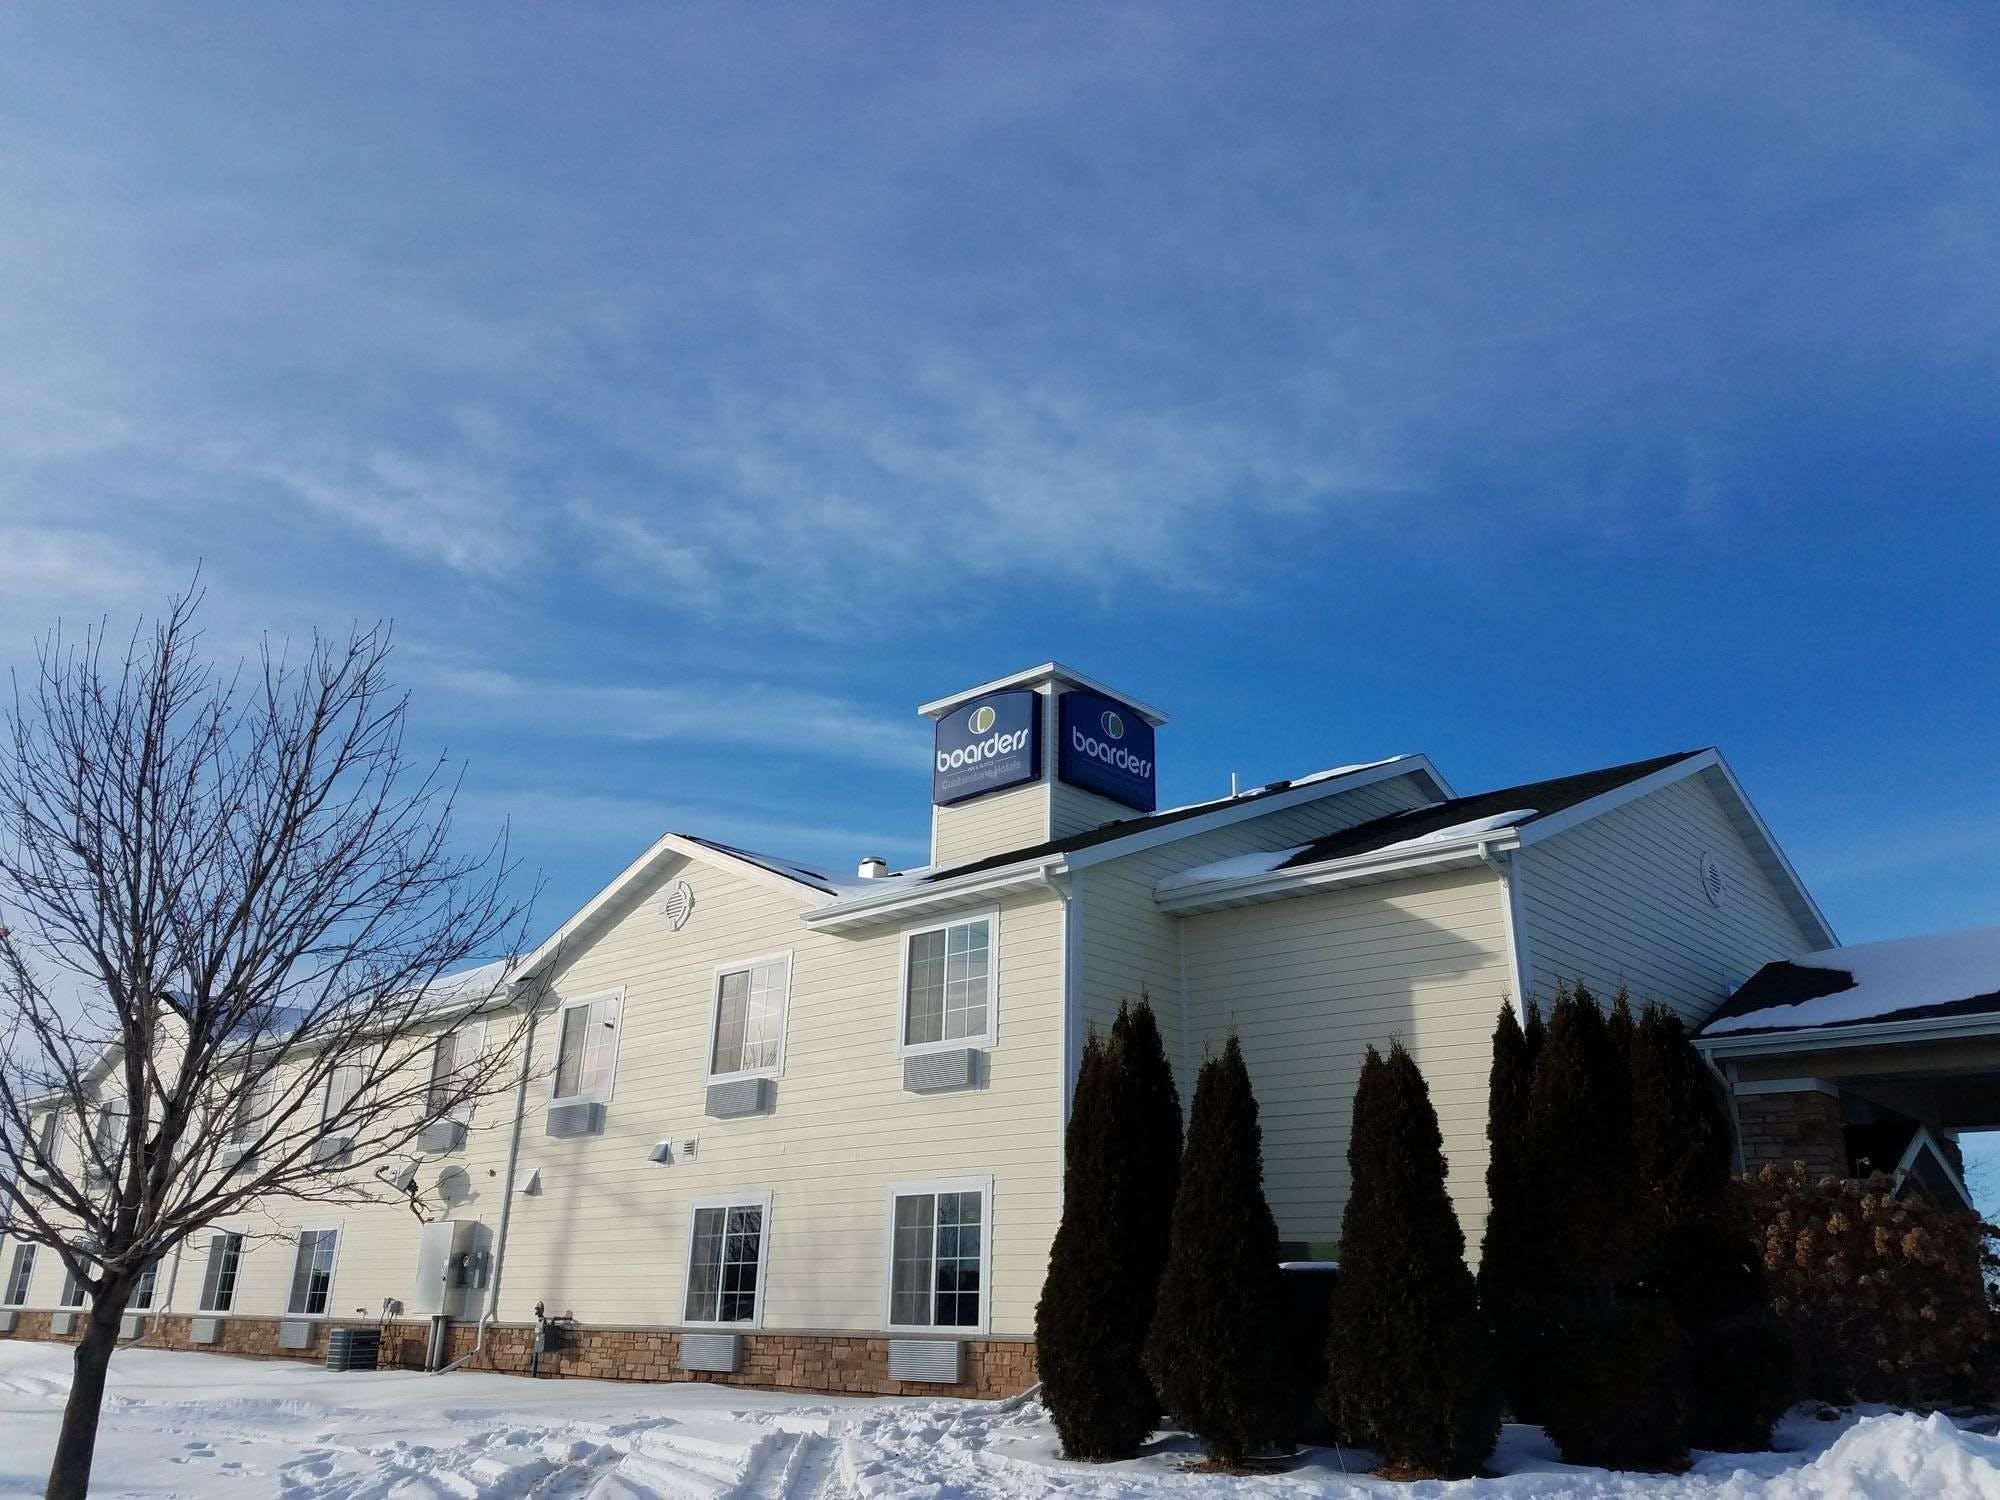 Boarders Inn & Suites by Cobblestone Hotels - Oshkosh